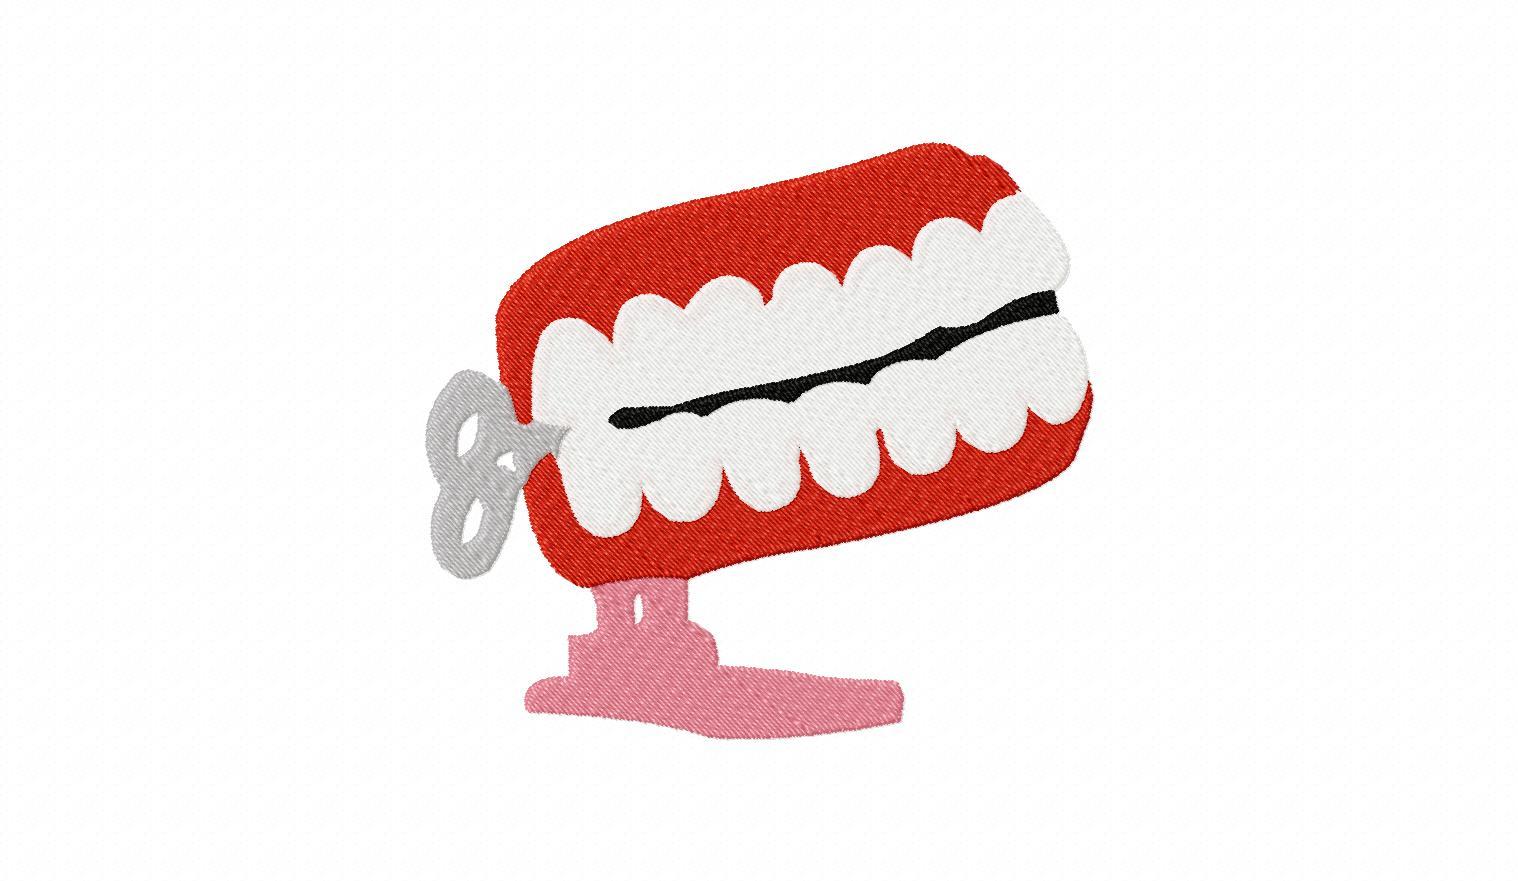 windup teeth machine embroidery design